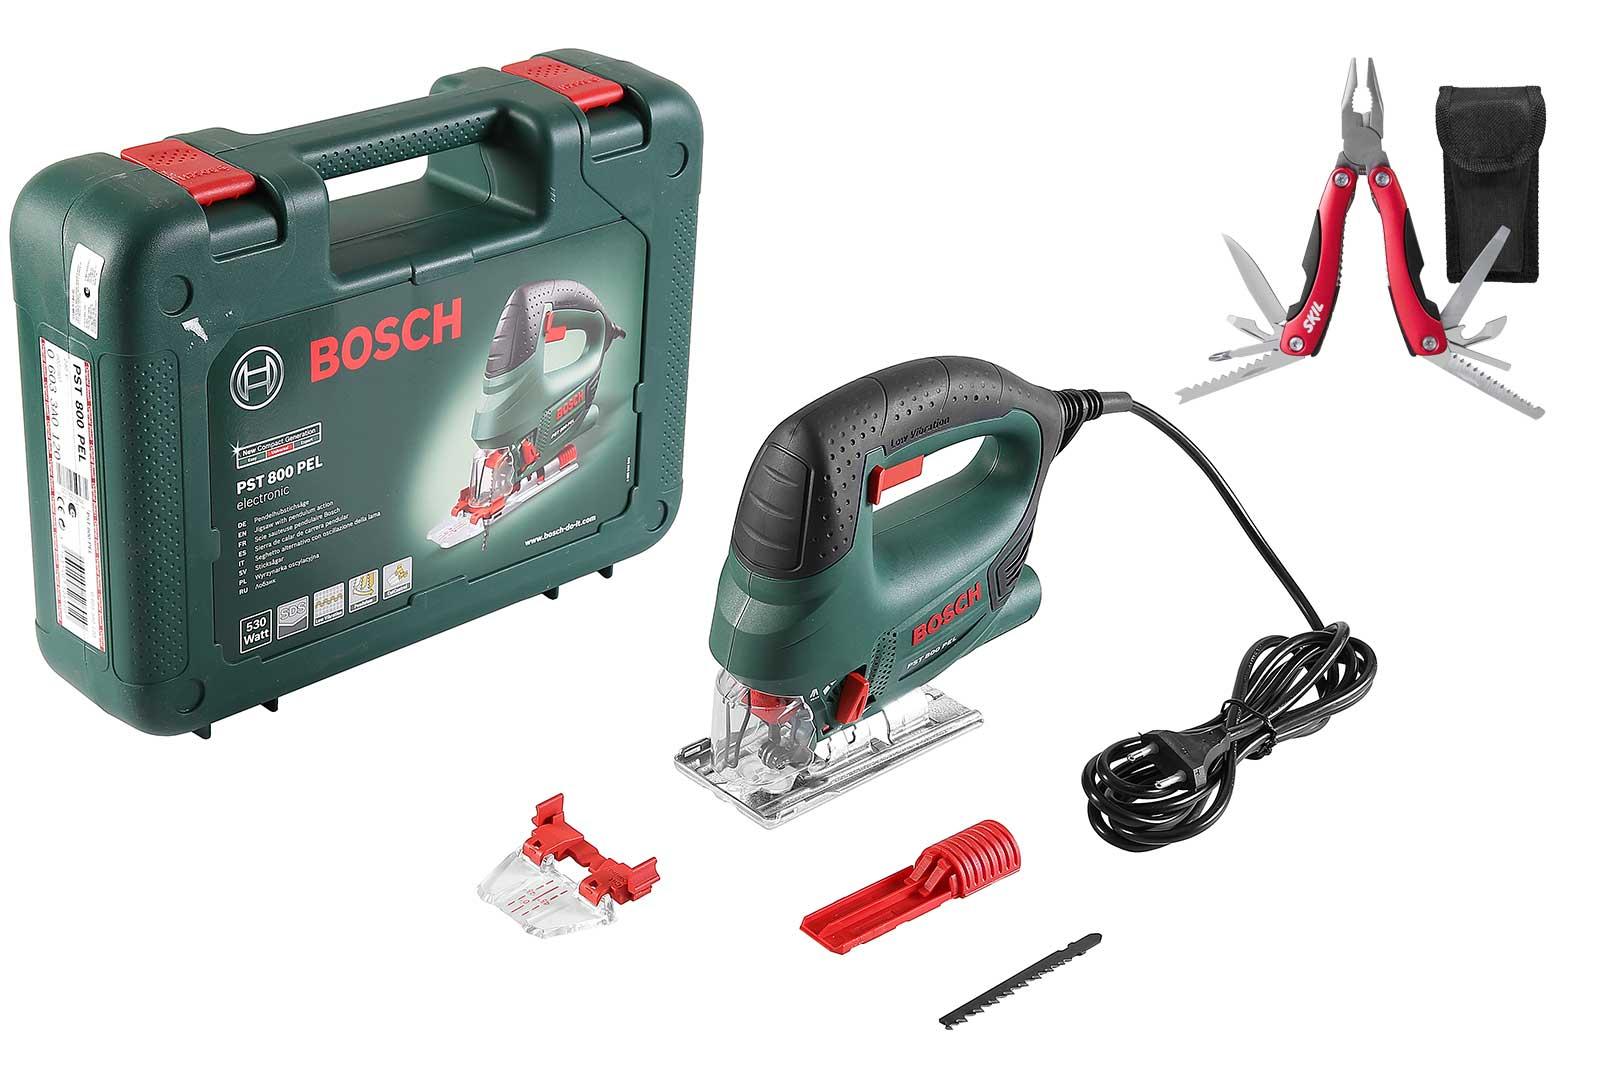 Лобзик Bosch Pst 800 pel compact + мультитул skil 2610z06083 14 в 1